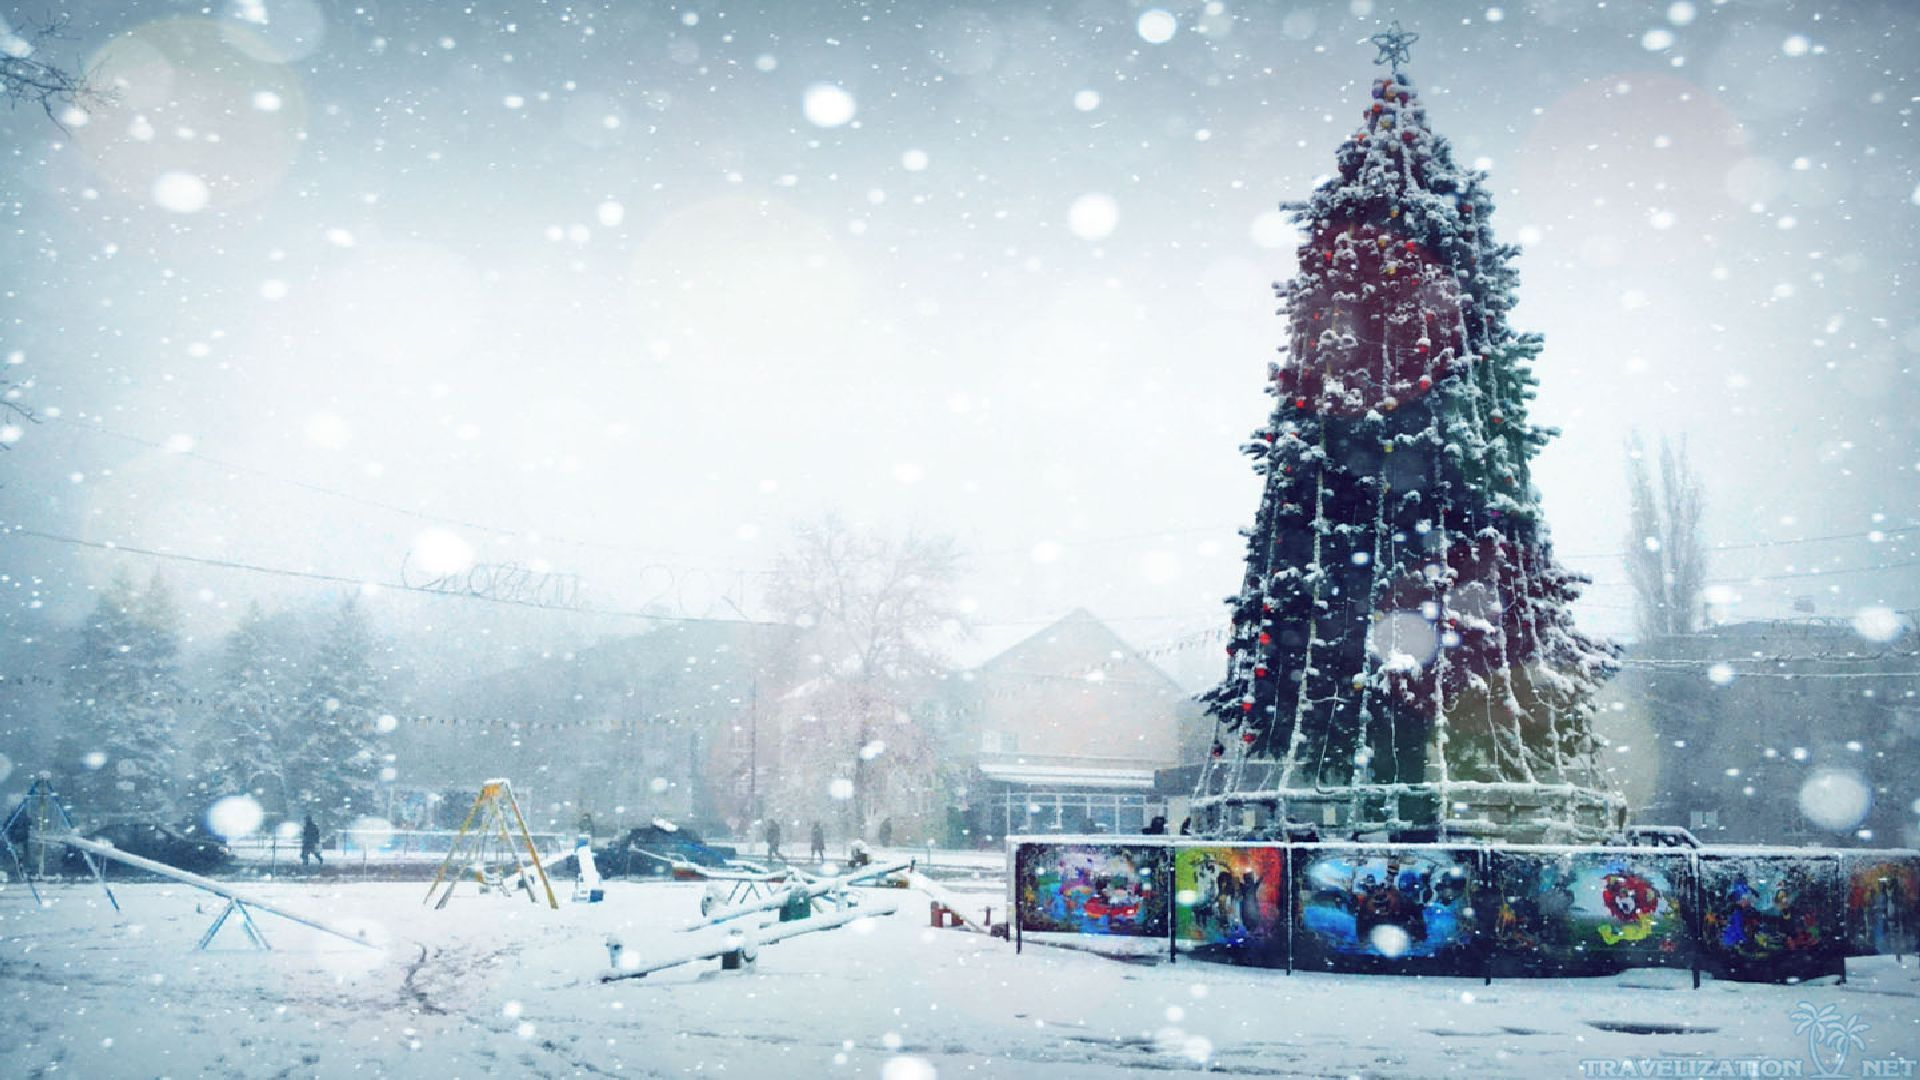 Popular Wallpaper Minecraft Christmas - 20398f06e382484bc68dafe93a43307b  Trends_664100.jpg